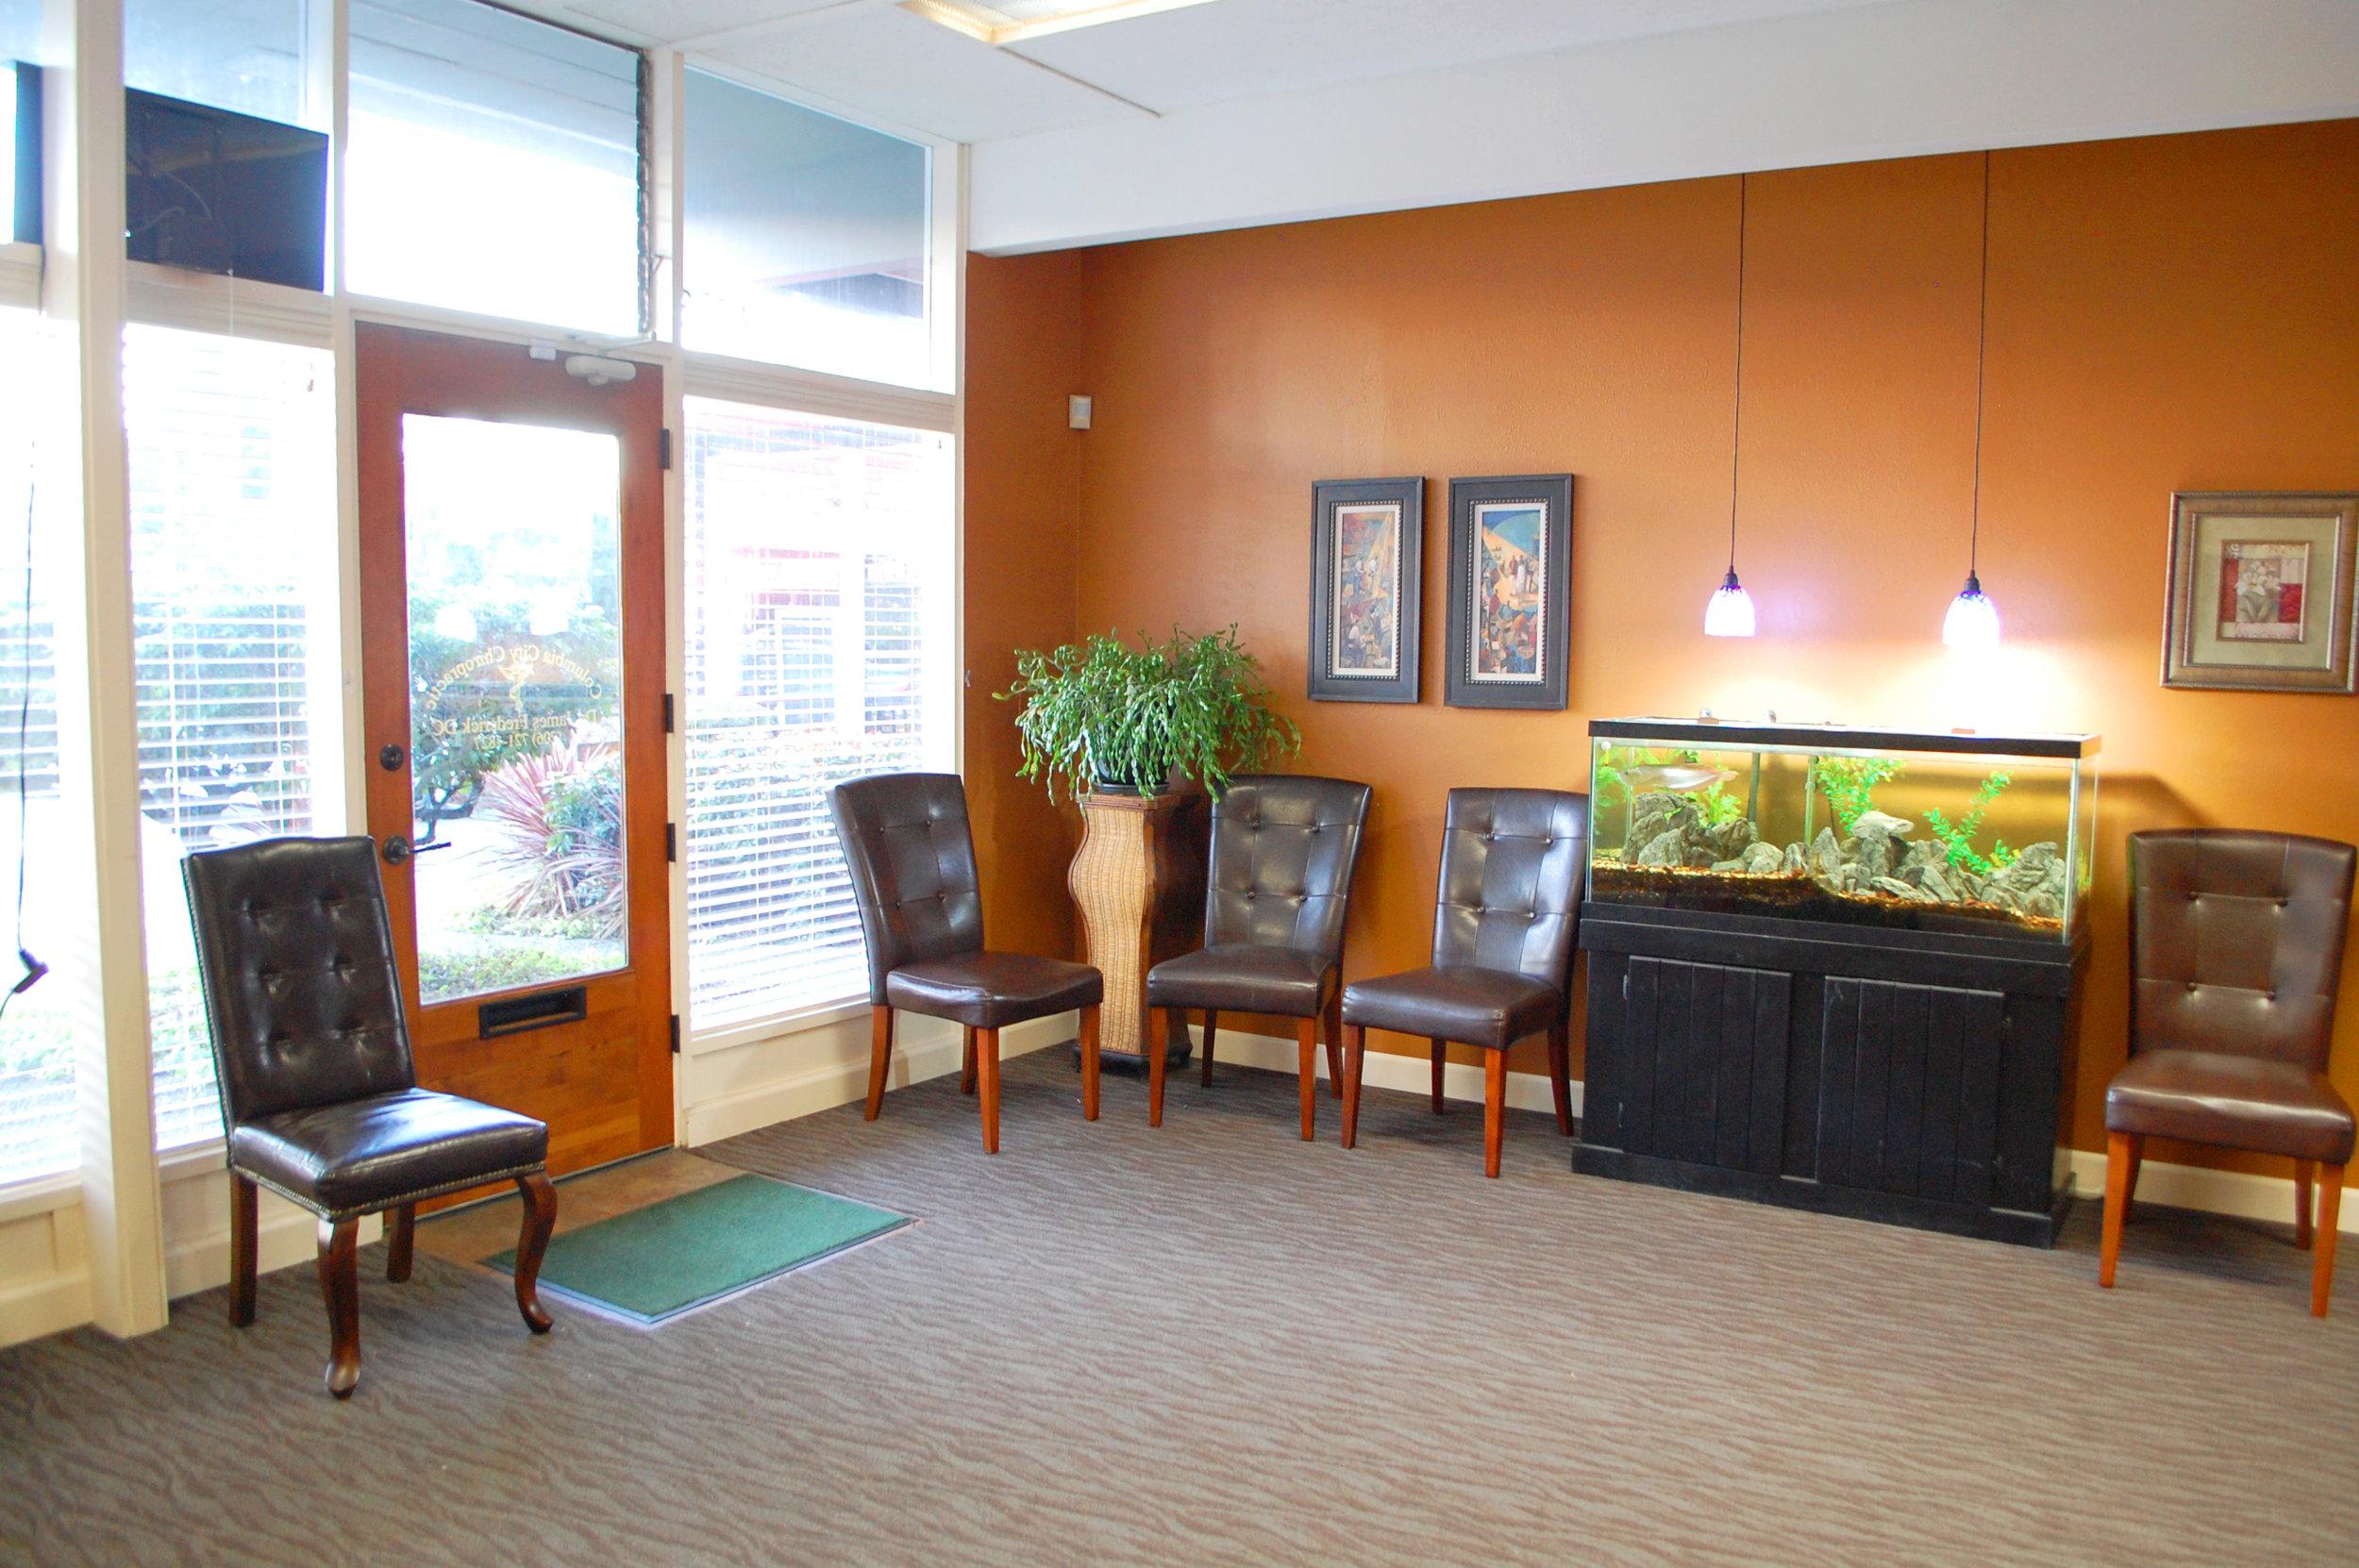 Columbia City Chiropractic Waiting Room 1